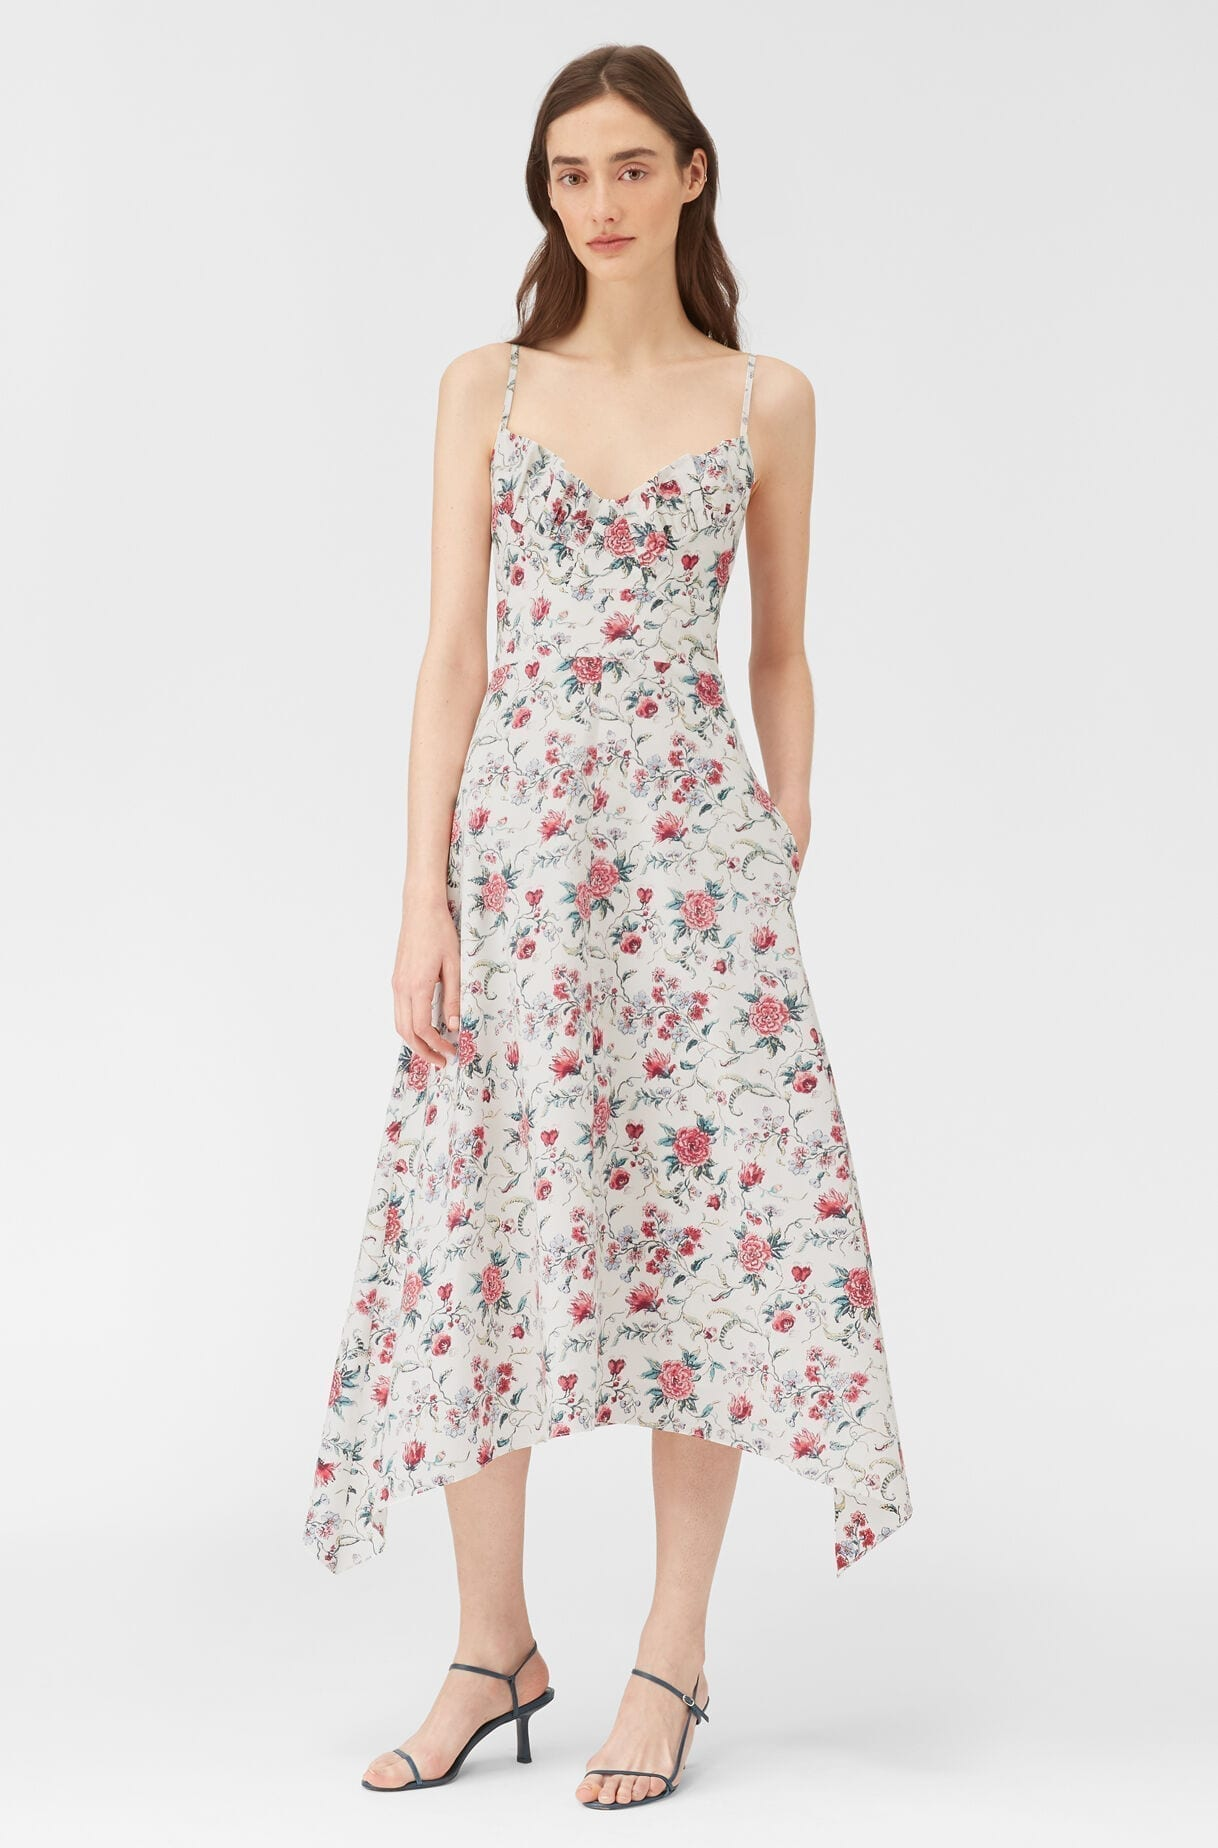 REBECCA TAYLOR Esmee Fleur Tank Dress